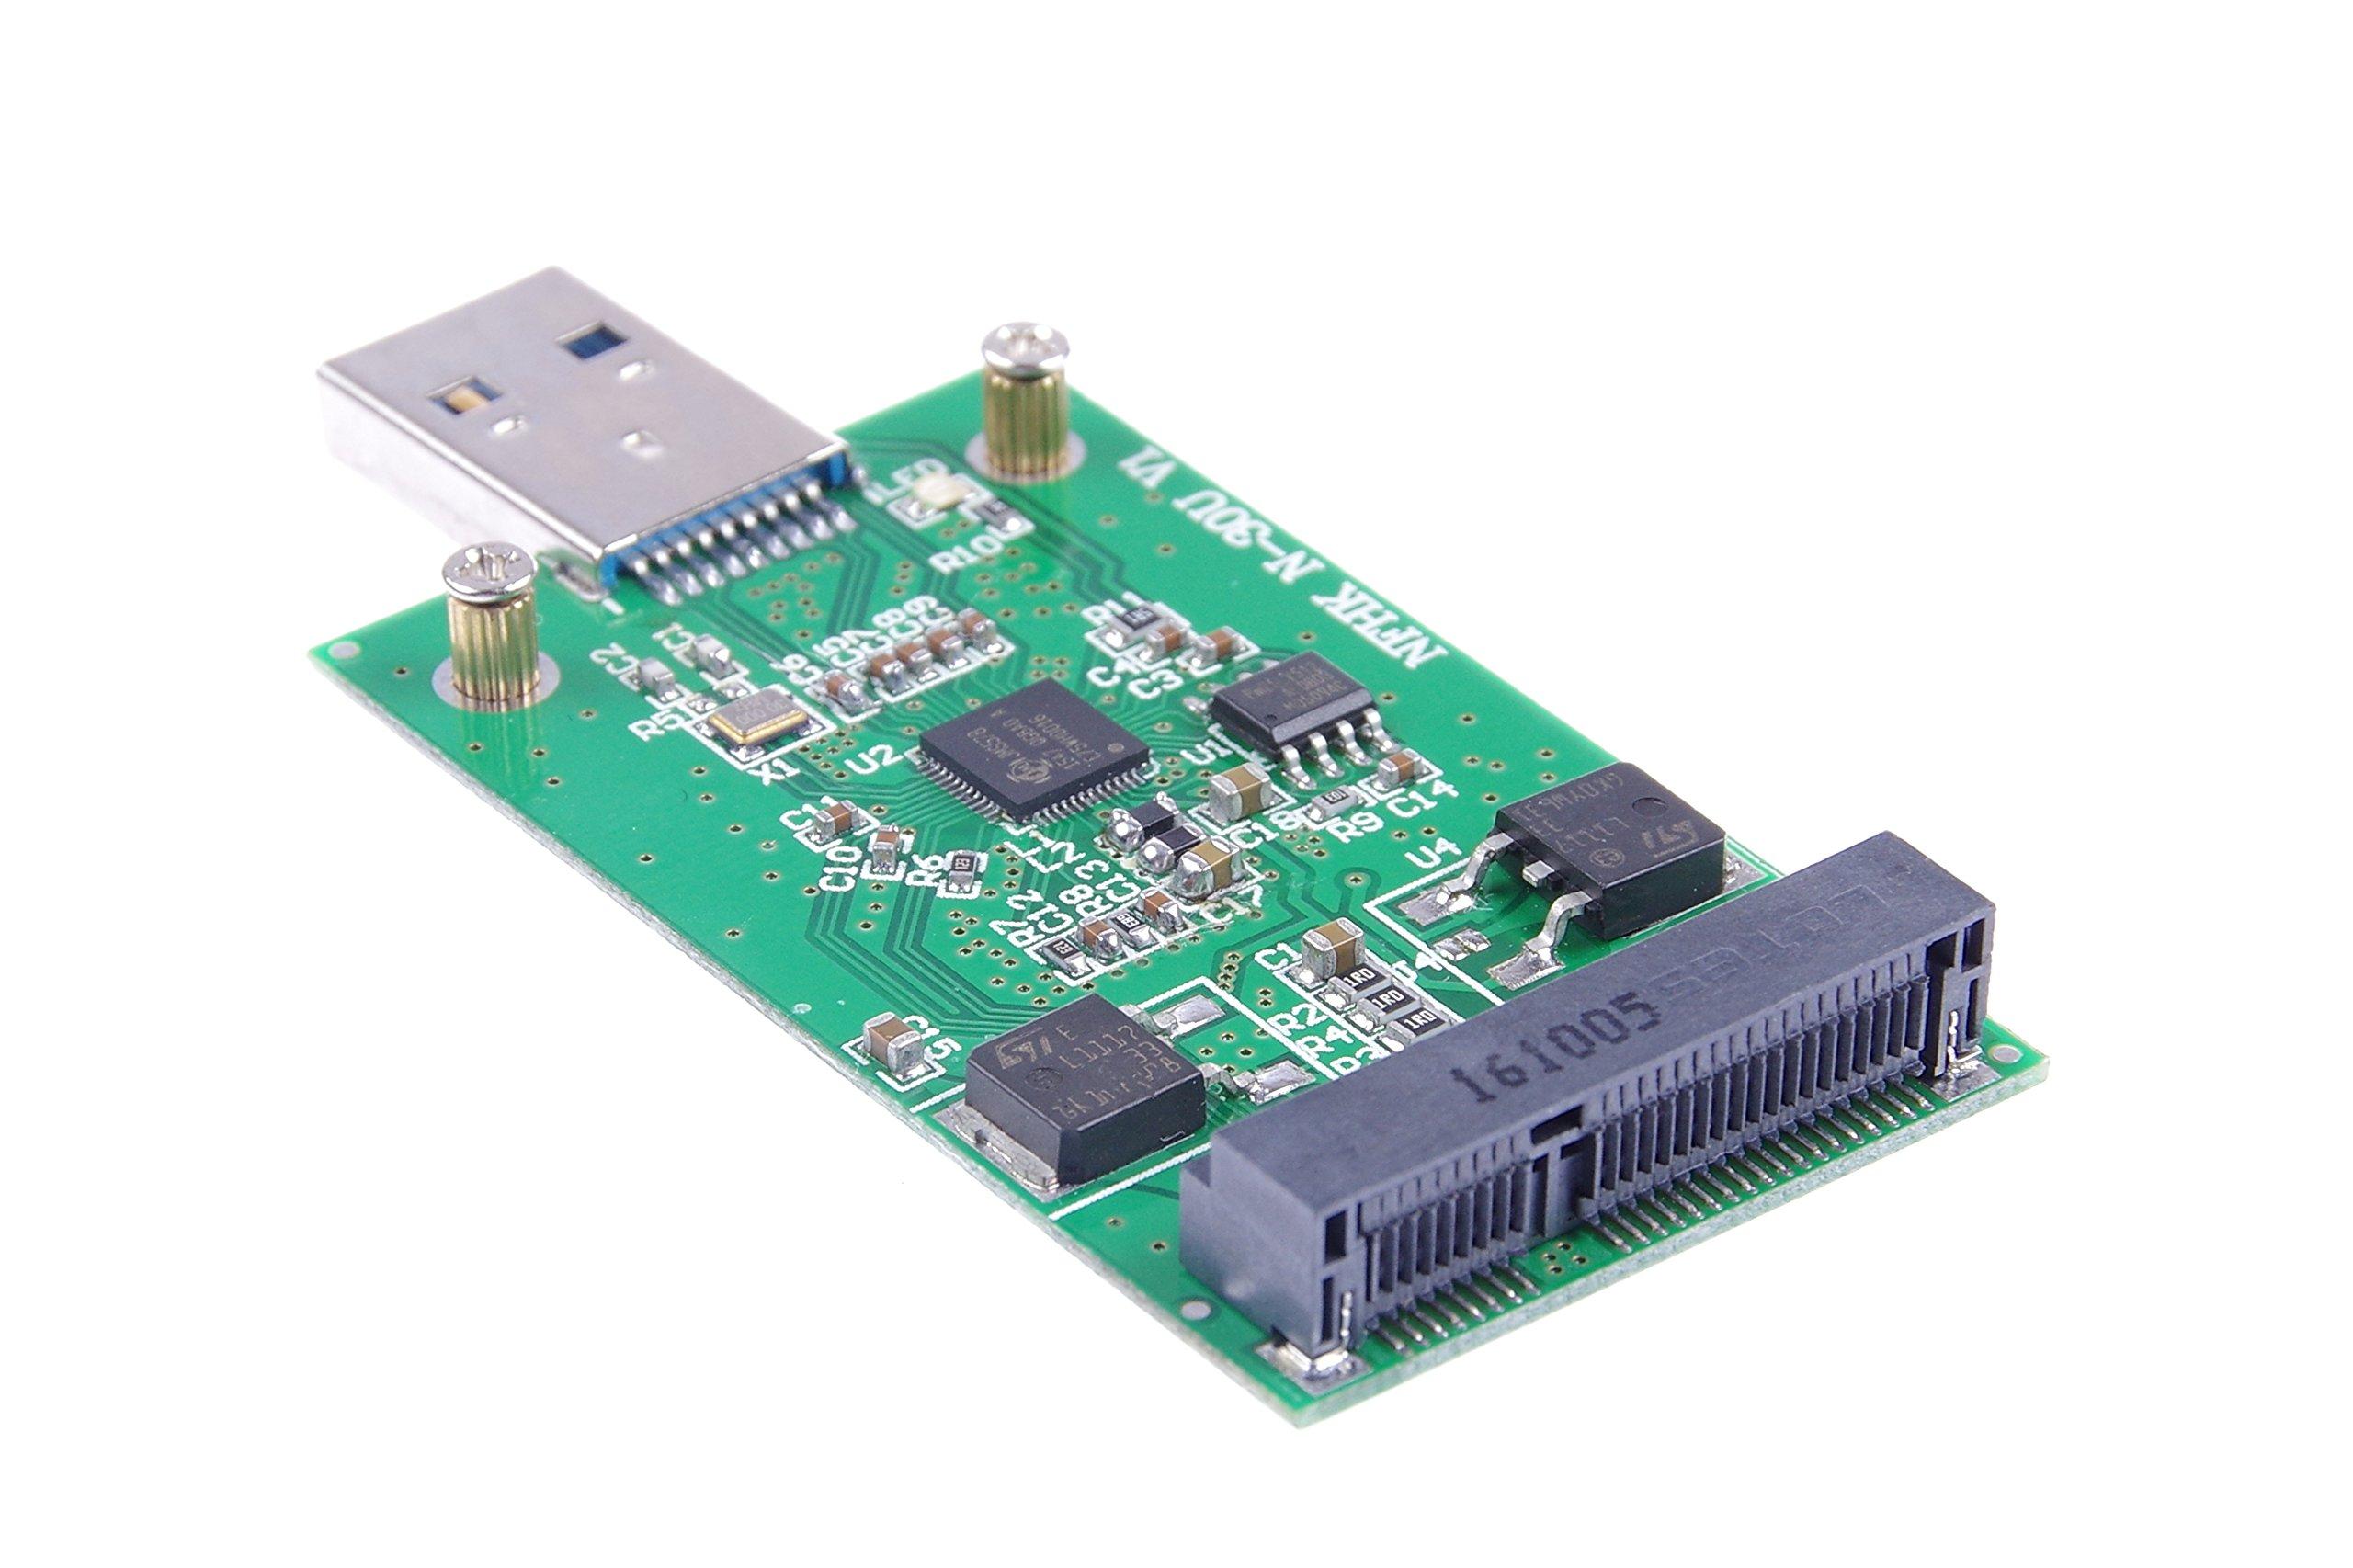 KNACRO USB 3.0 mSATA SSD Adapter as USB Disk Driver don't need USB cable USB 3.0 to mSATA SSD adapter card by KNACRO (Image #3)